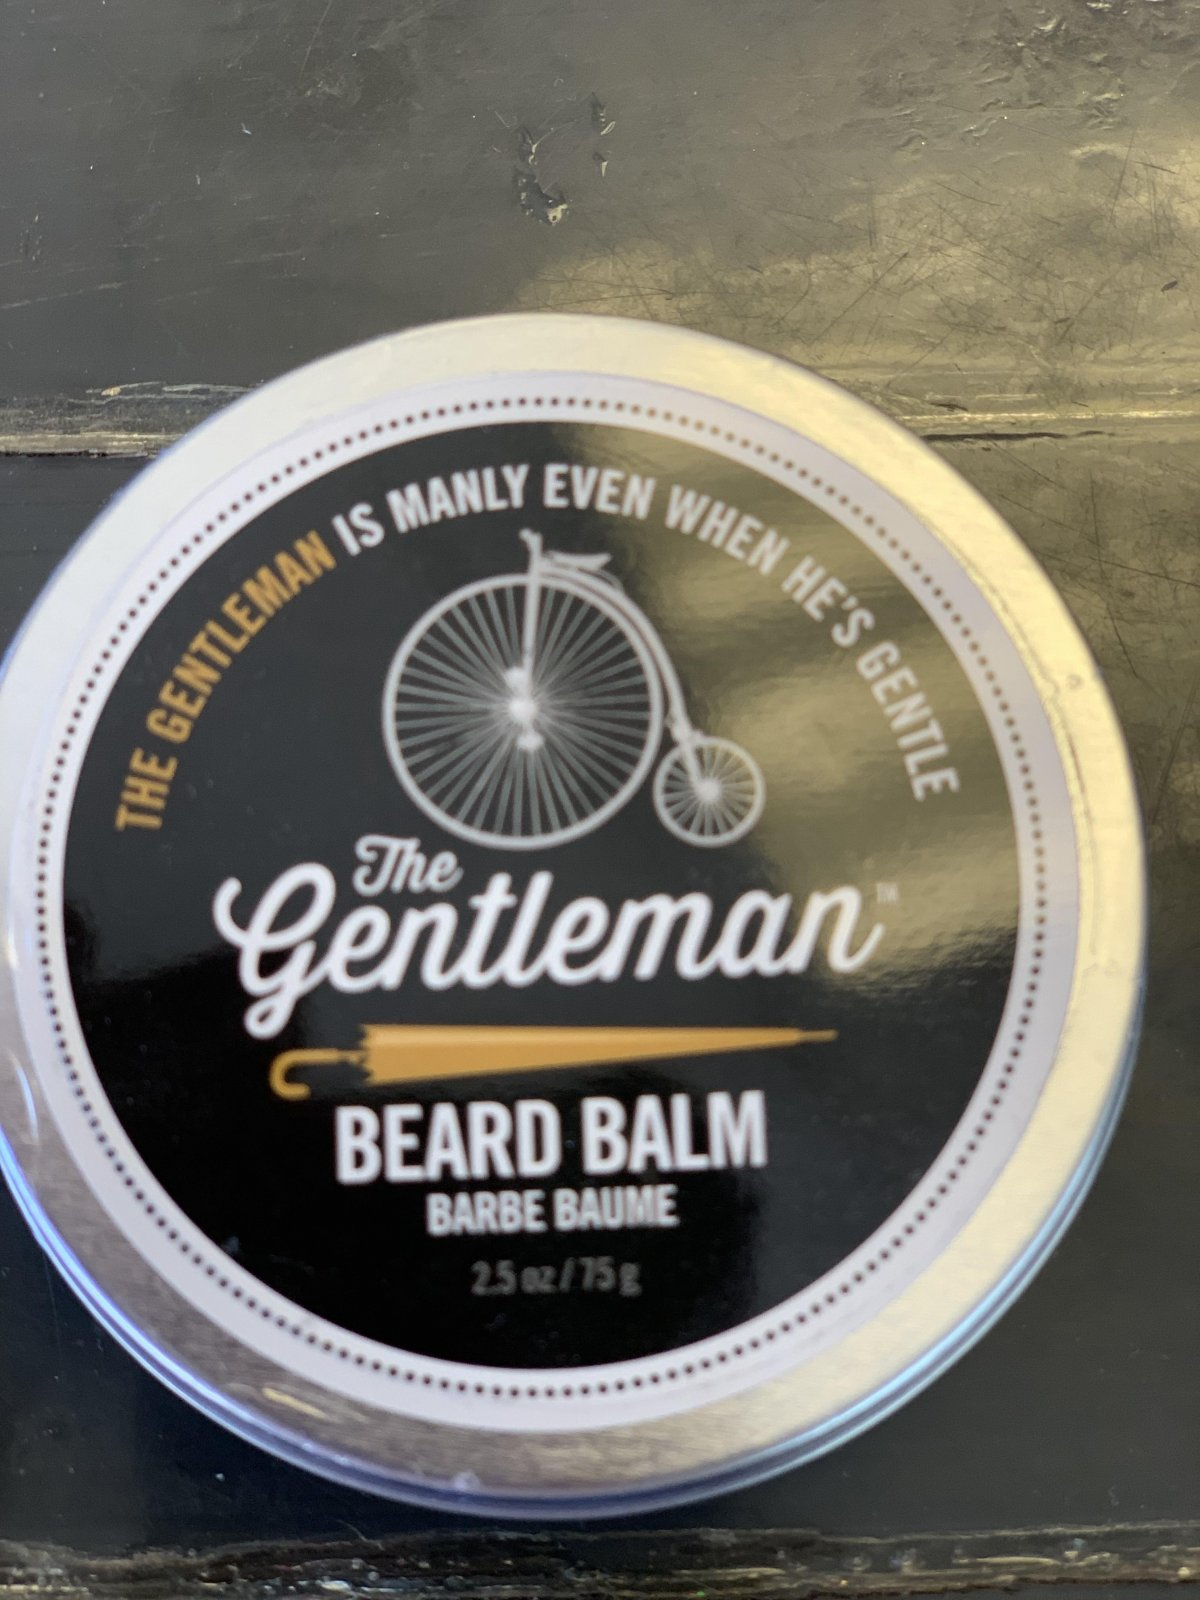 The Gentleman Beard Balm